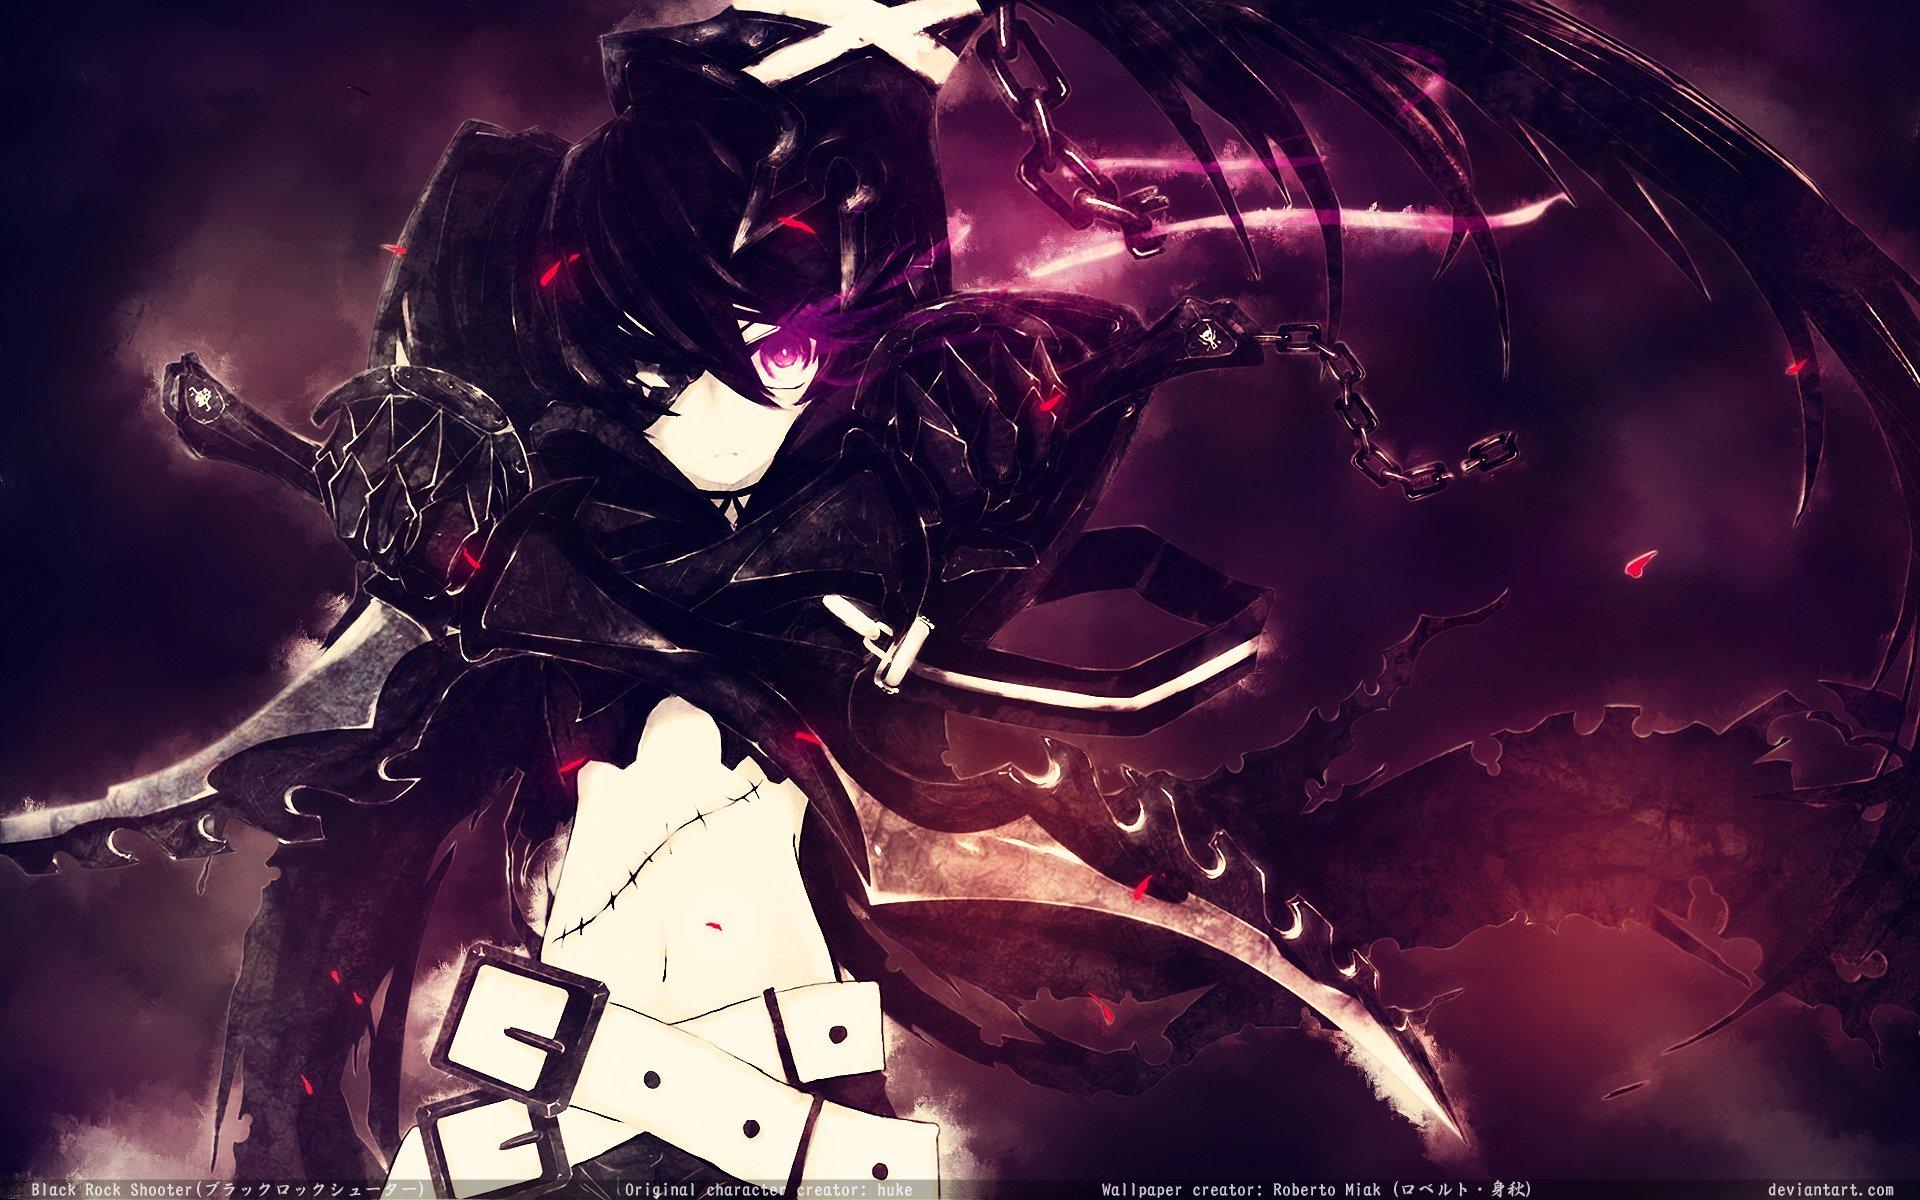 Anime - Black Rock Shooter  Insane Black Rock Shooter Wallpaper